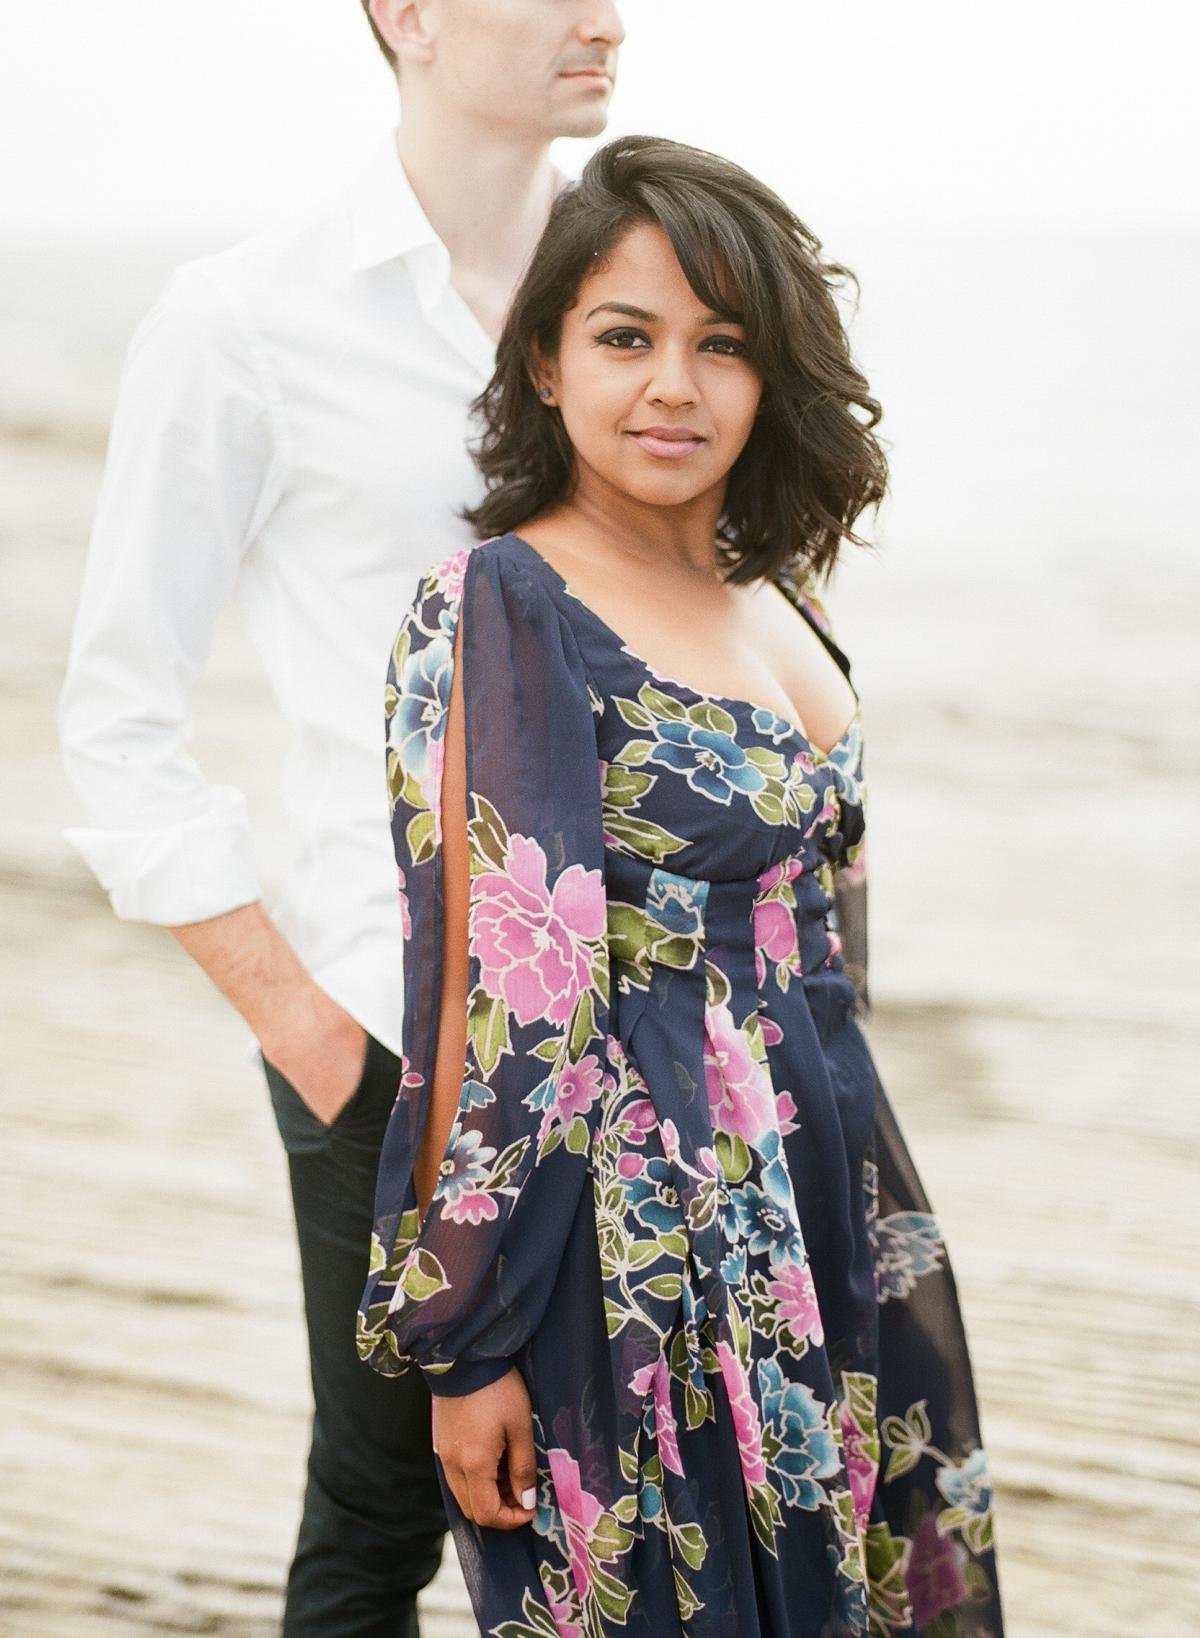 Coastal Sydney couples session by Mr Edwards Photography_0737_1125.jpg